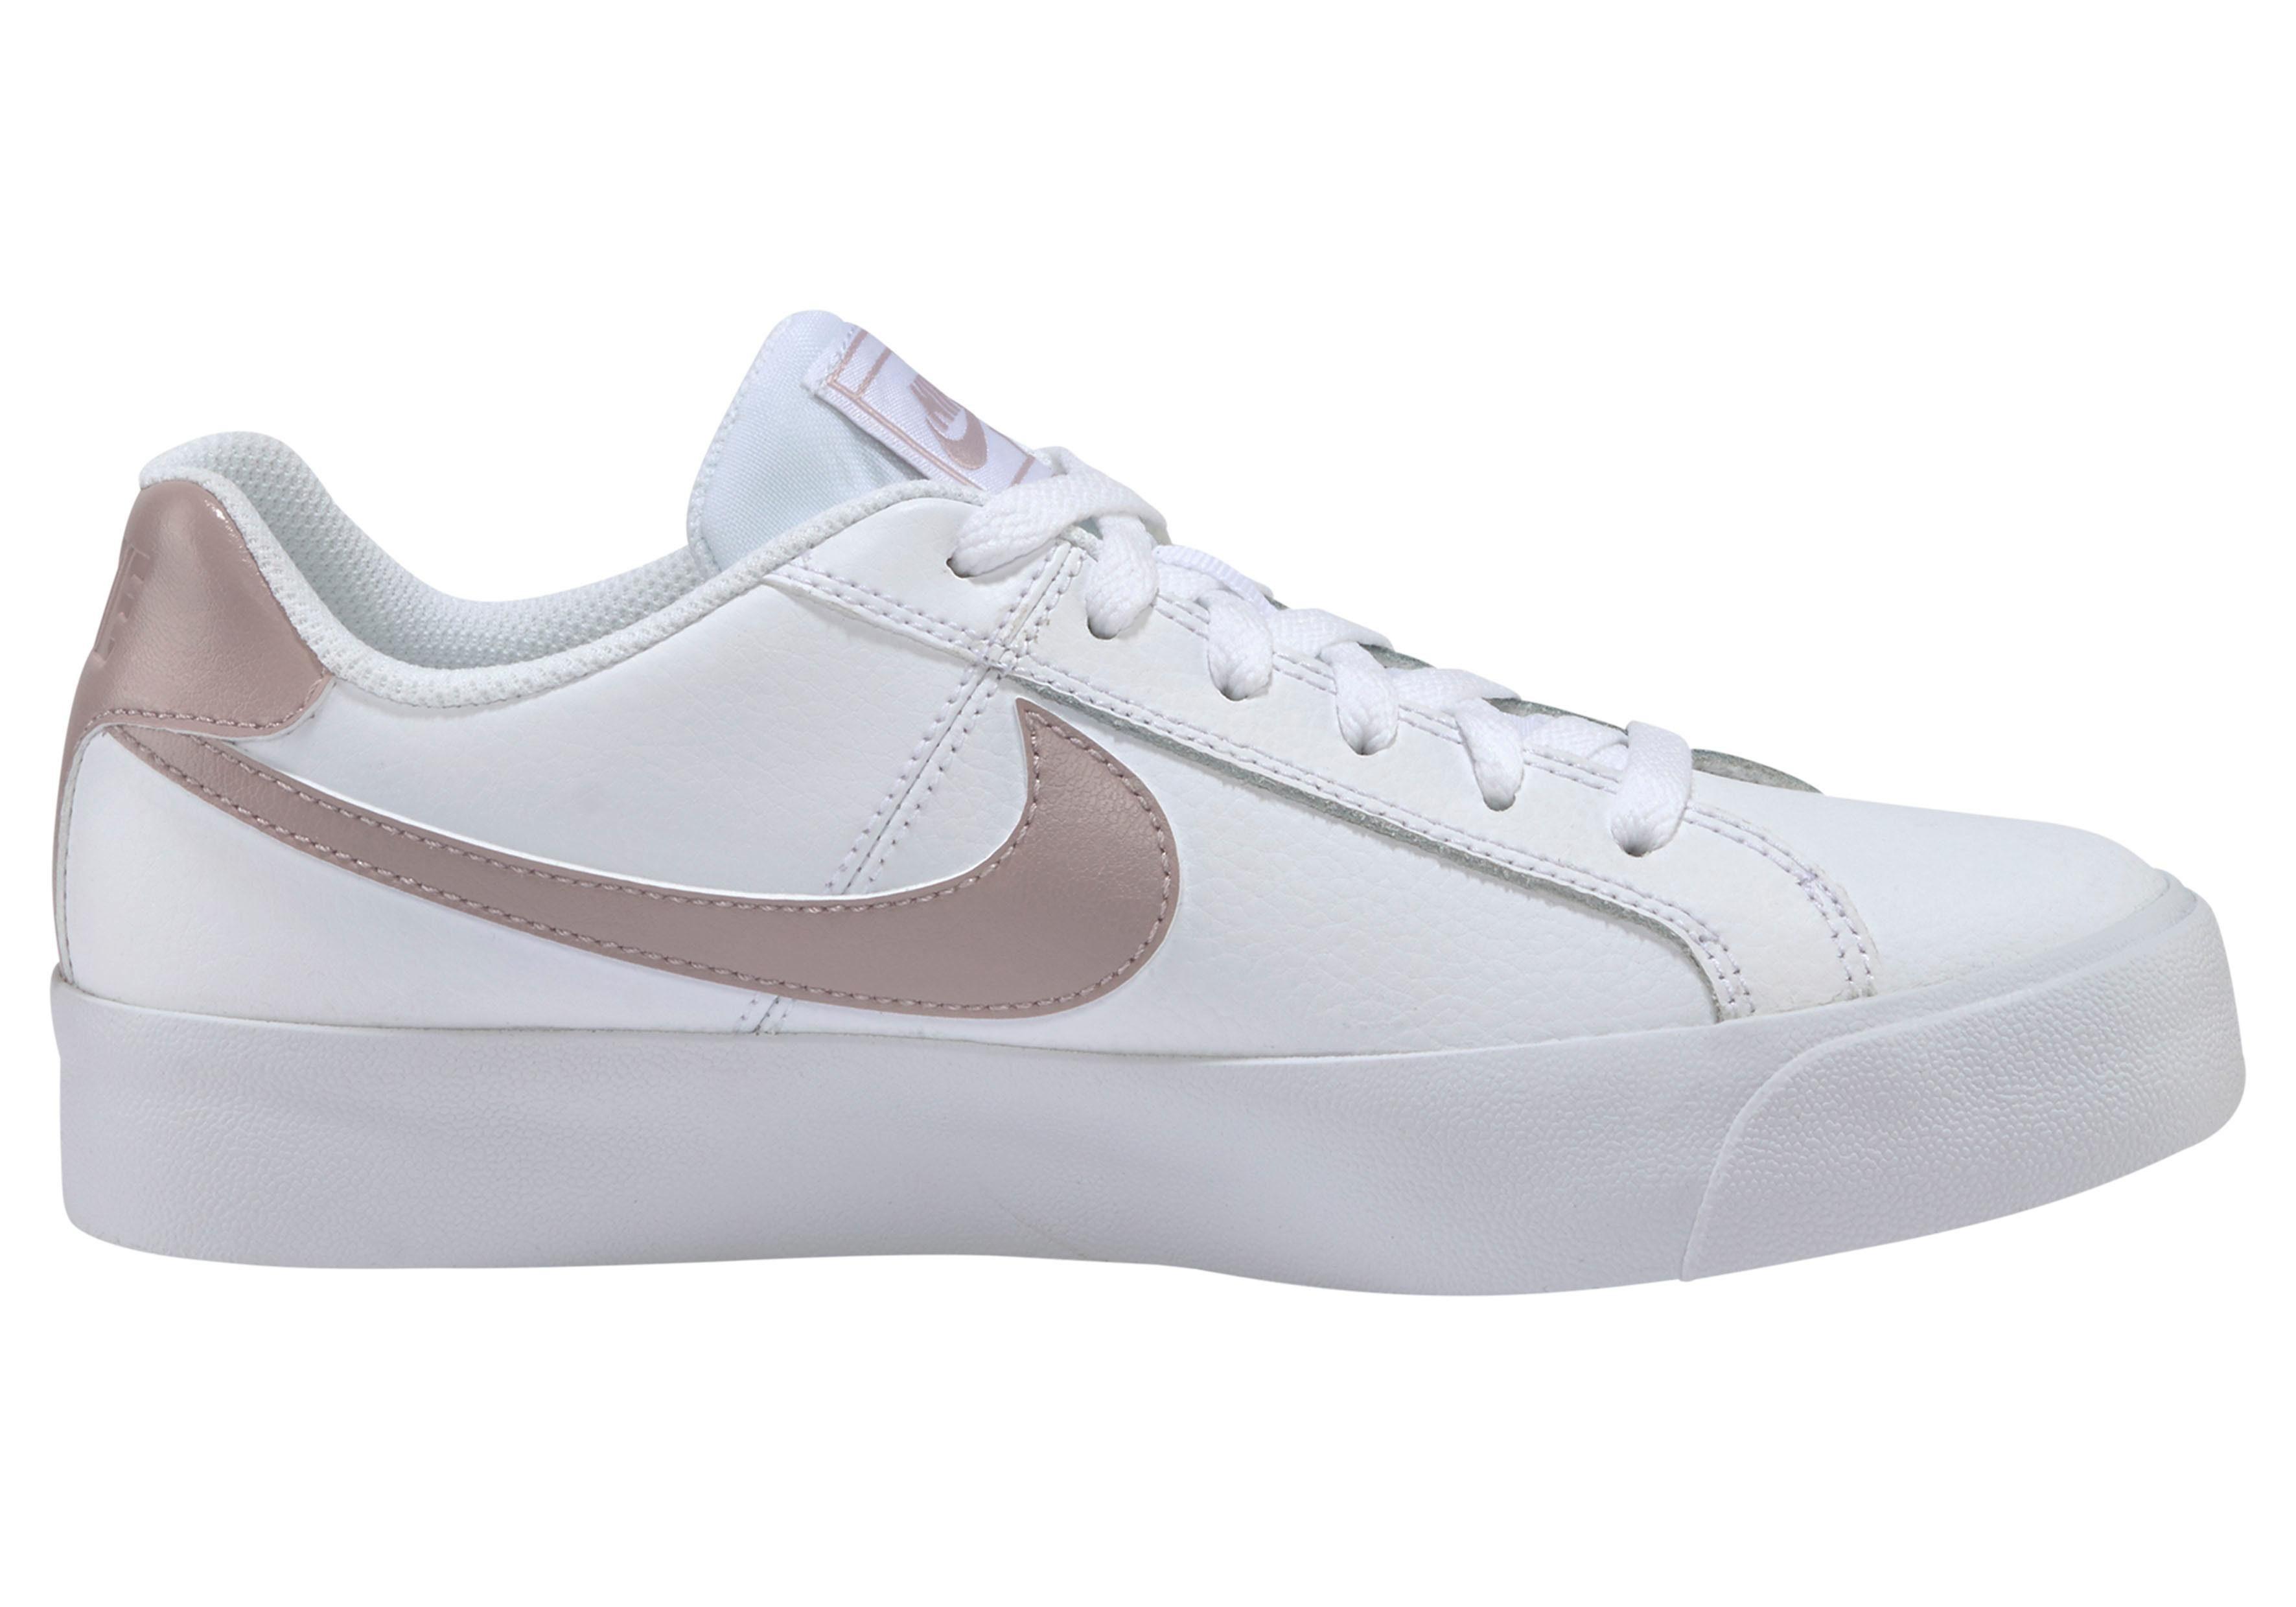 wit nike royale sneakers court ac« sportswear »wmns fqSHYrUq